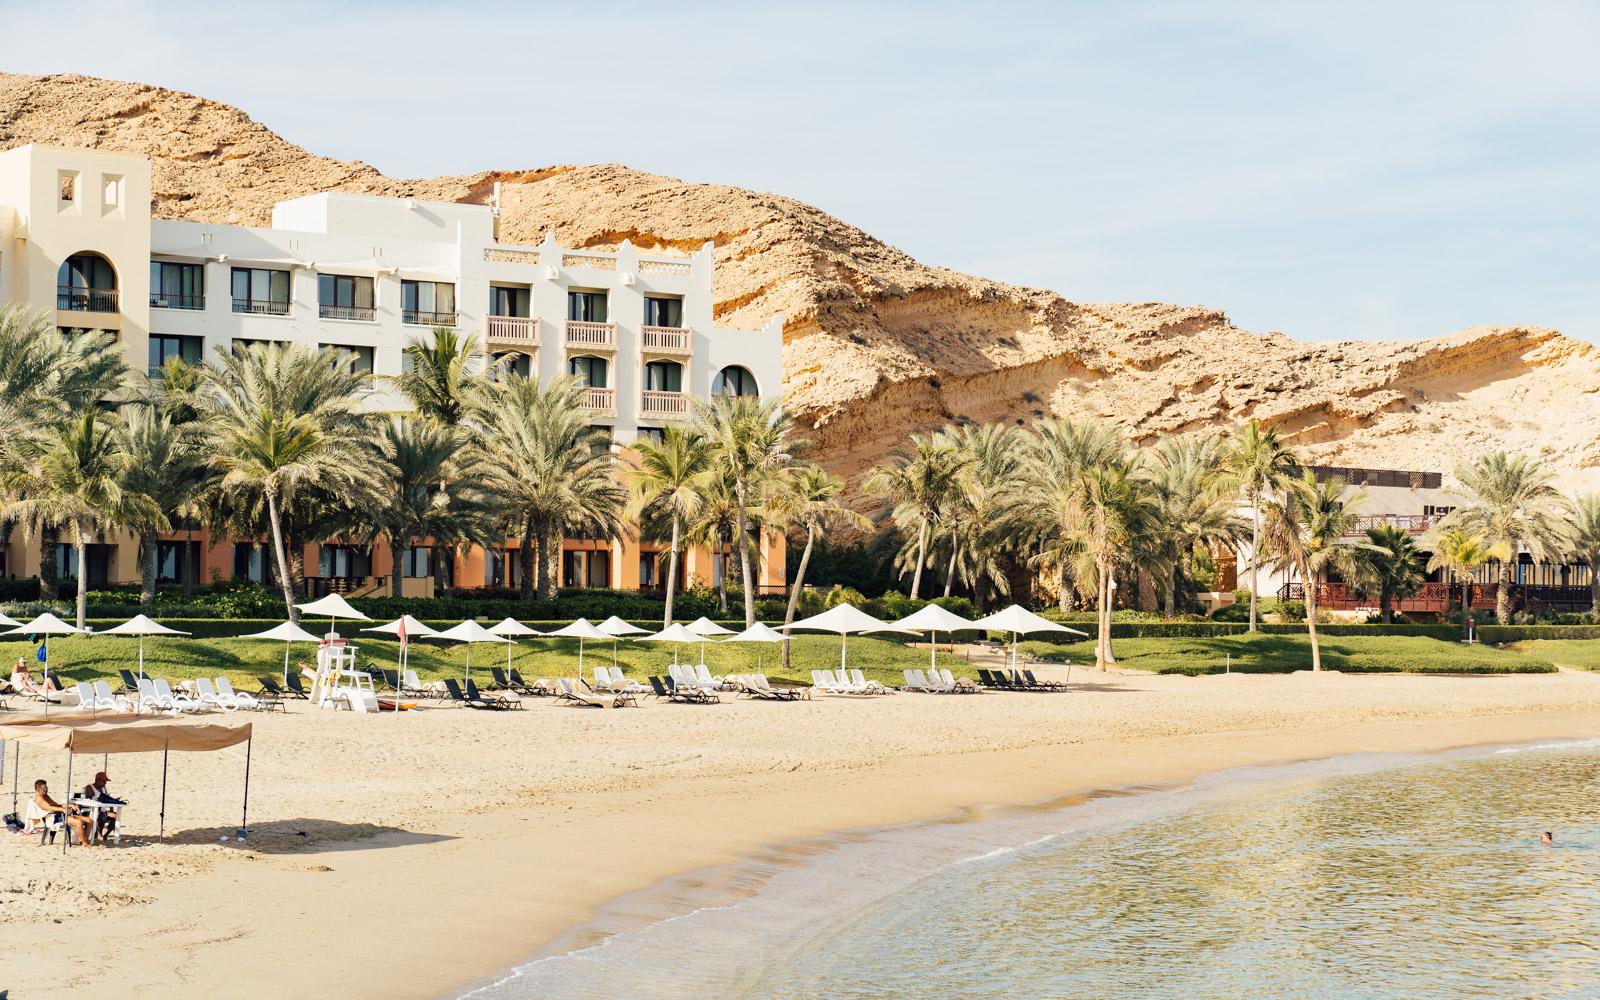 Shangri La Hotel near Muscat overlooking 500-metres of stunning coastline.